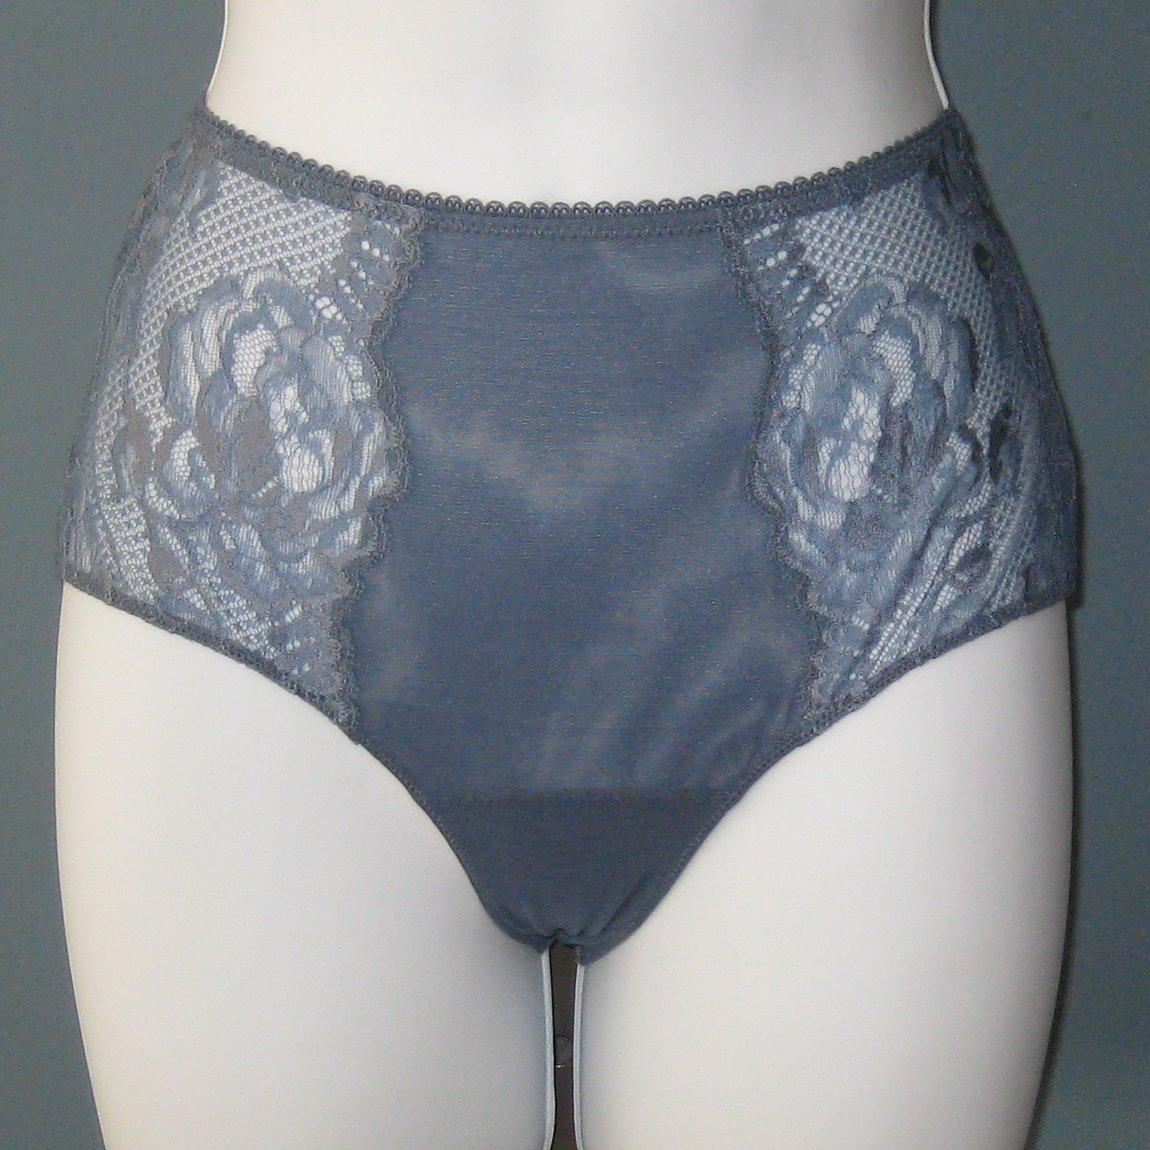 NWT La Perla Blue Begonia High Rise Brief Panty #0019552 - XS